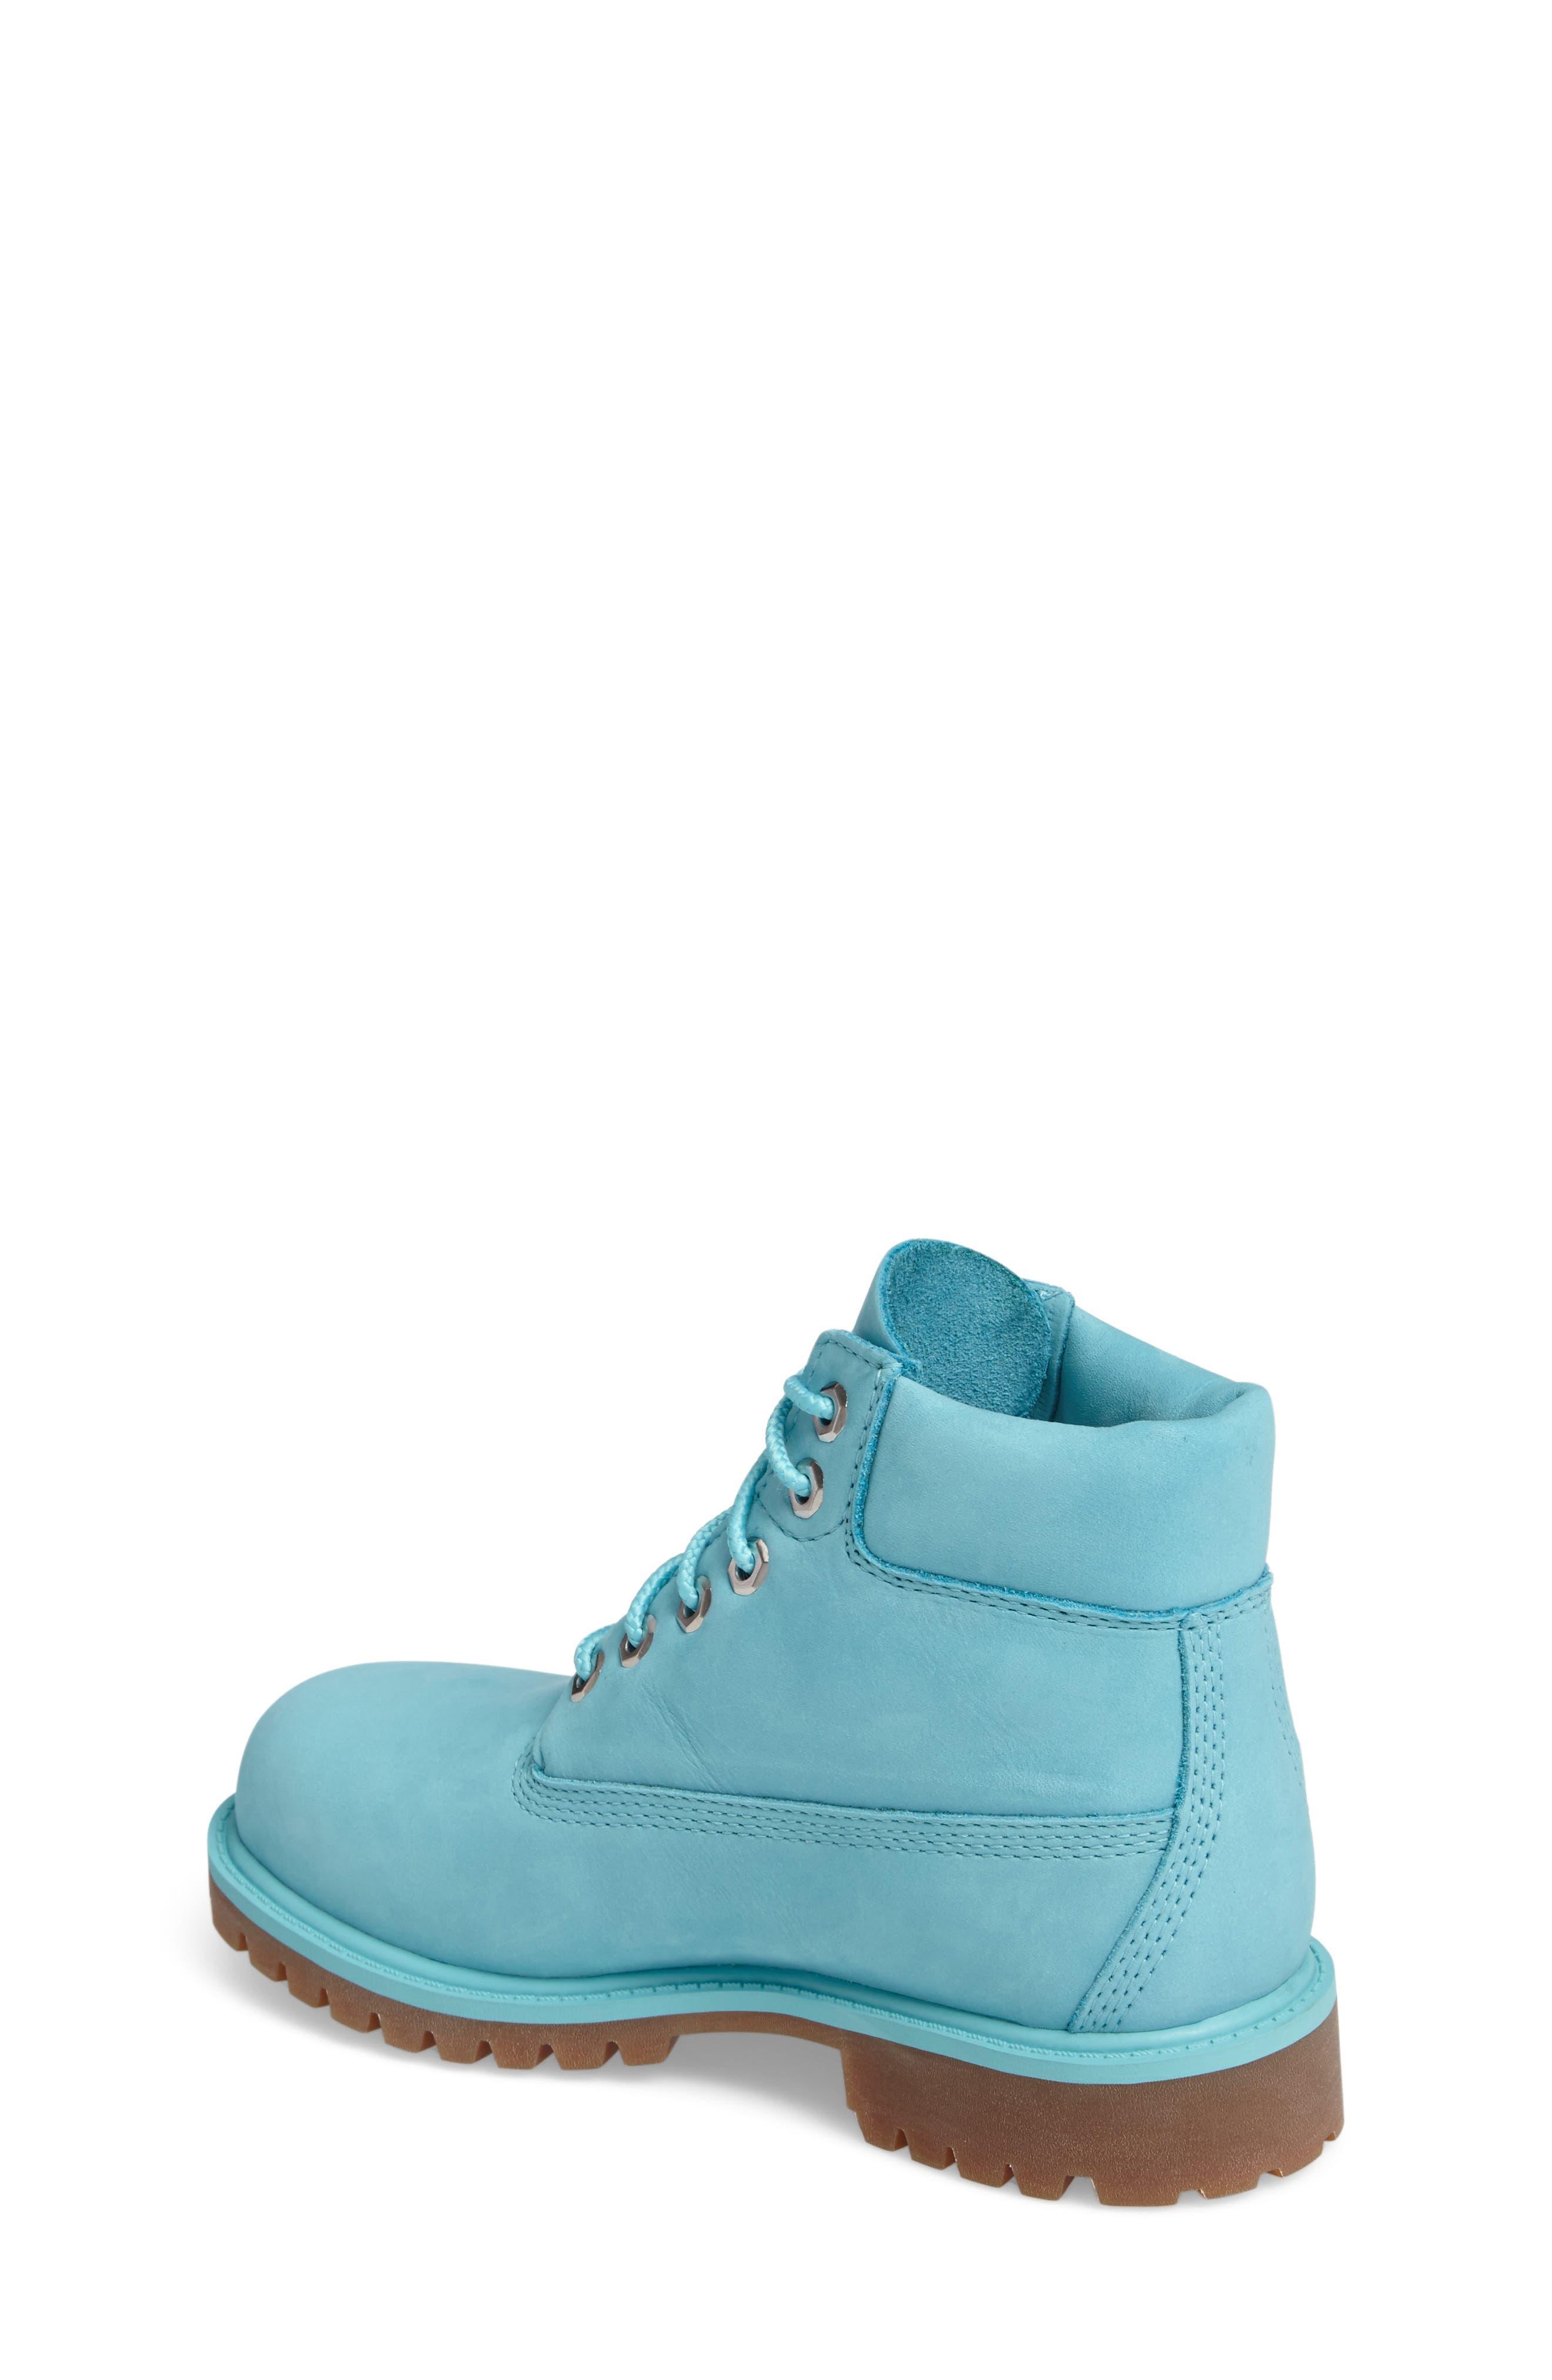 6-Inch Premium Waterproof Boot,                             Alternate thumbnail 2, color,                             Tide Waterpool Waterbuck